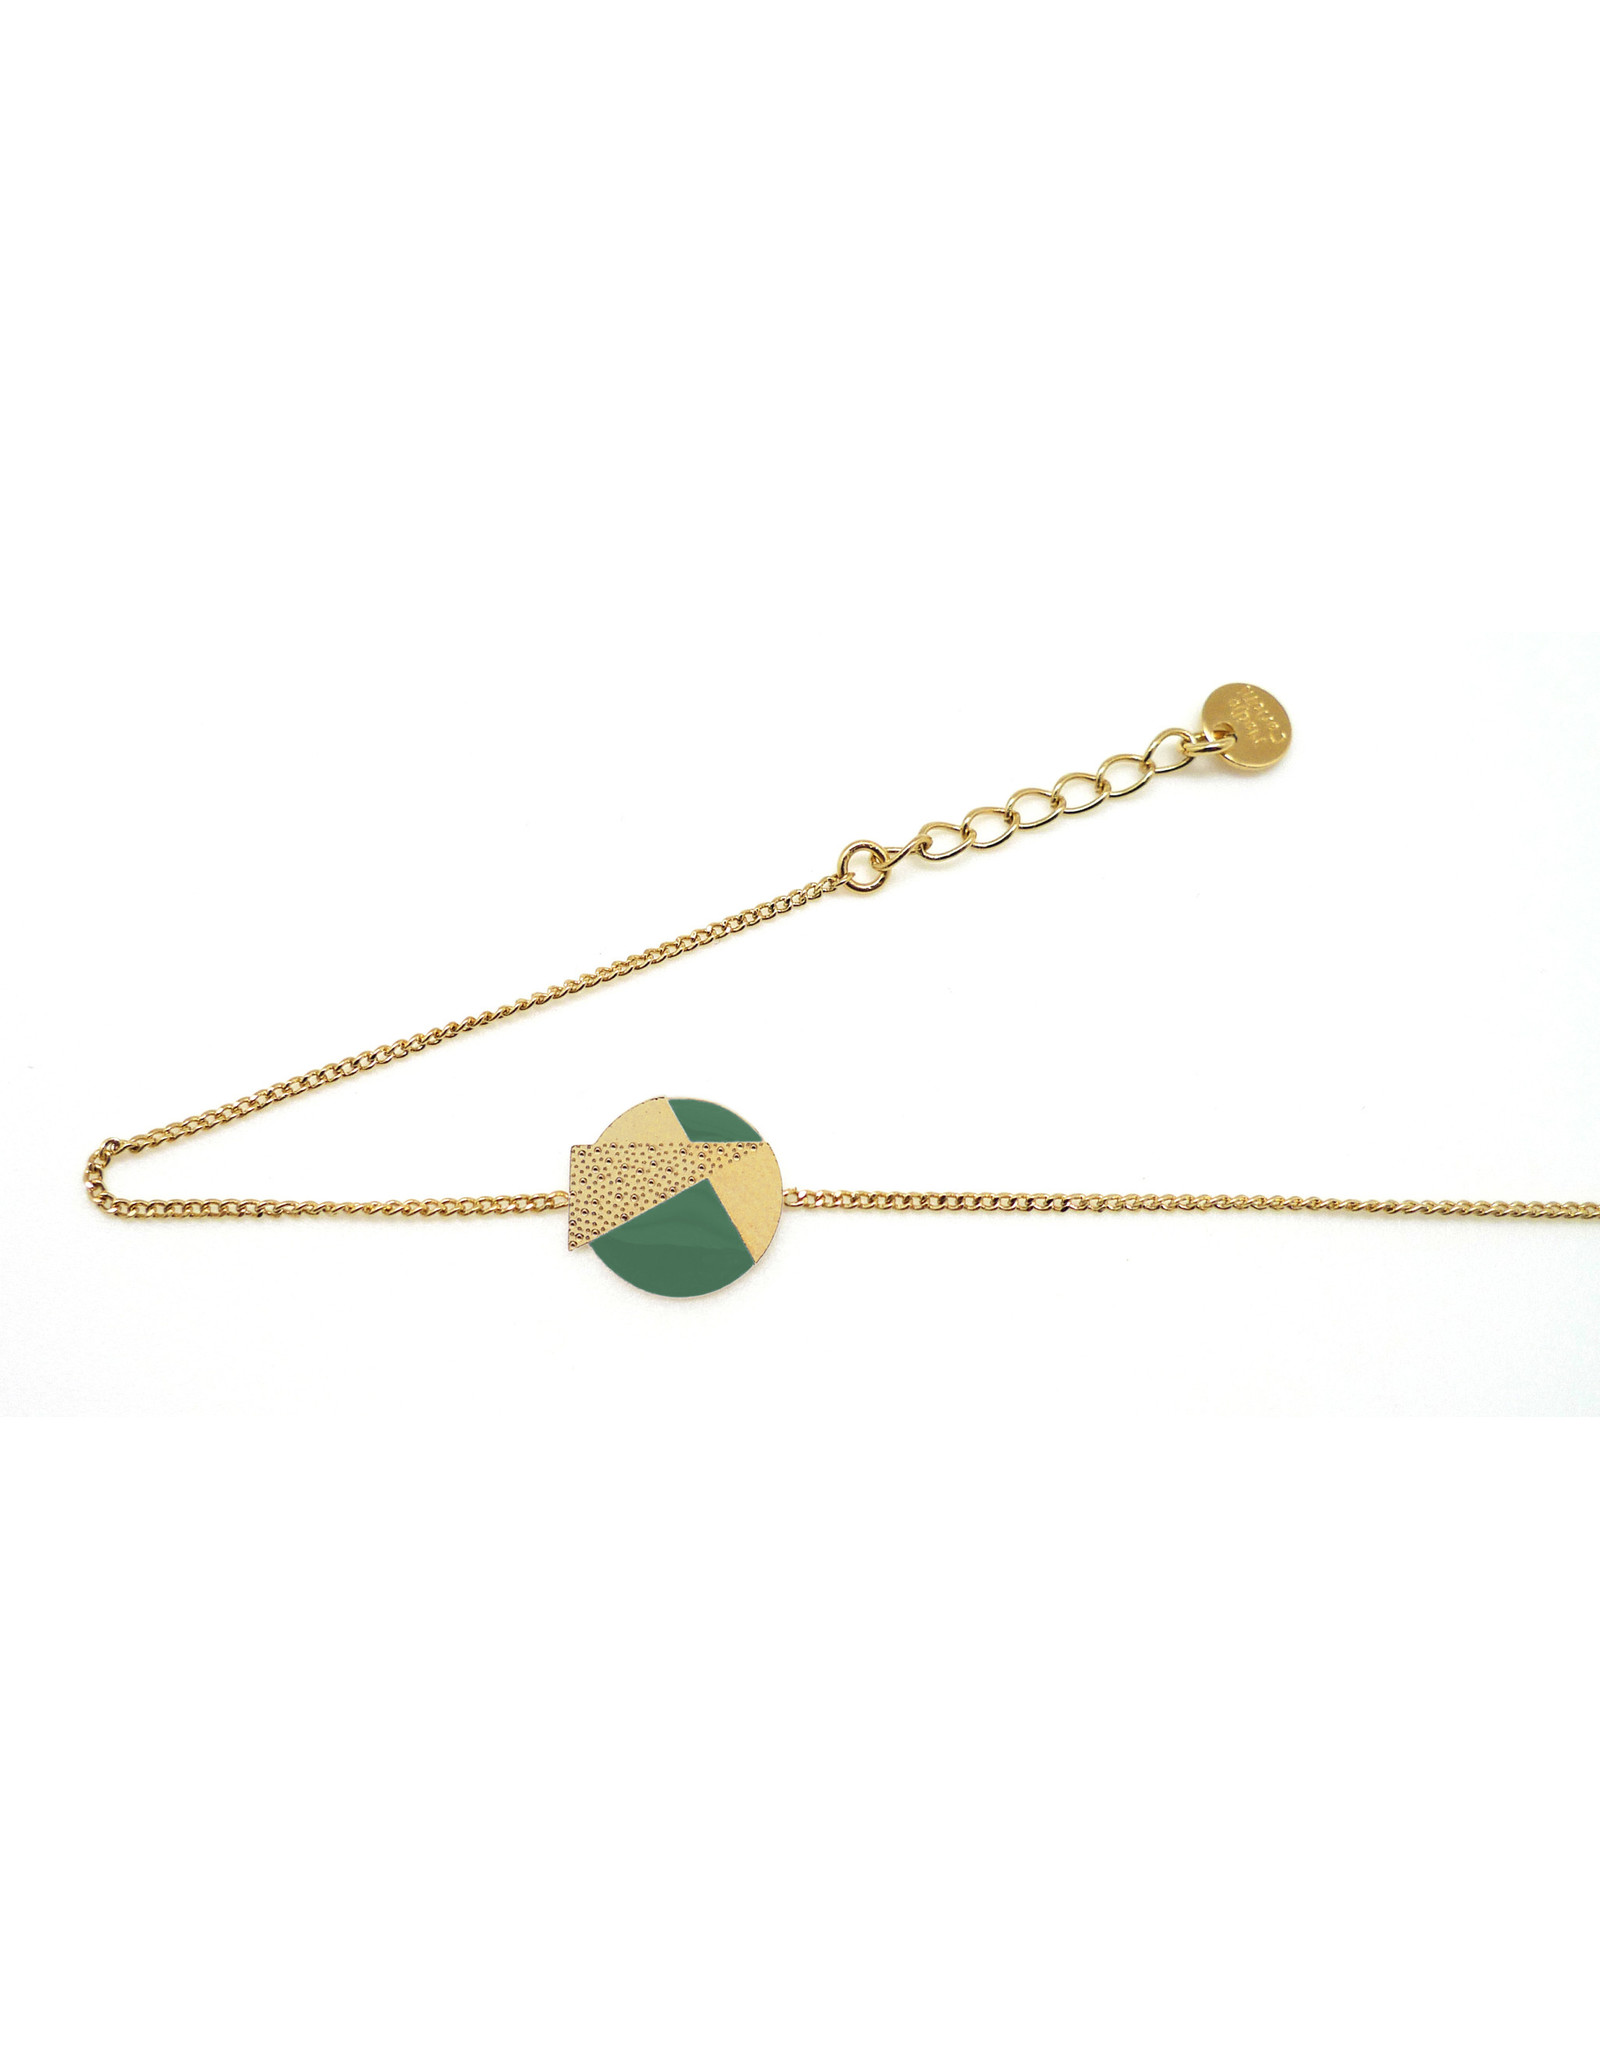 Nadja Carlotti Armband Lizzy - Groen - Messing verguld